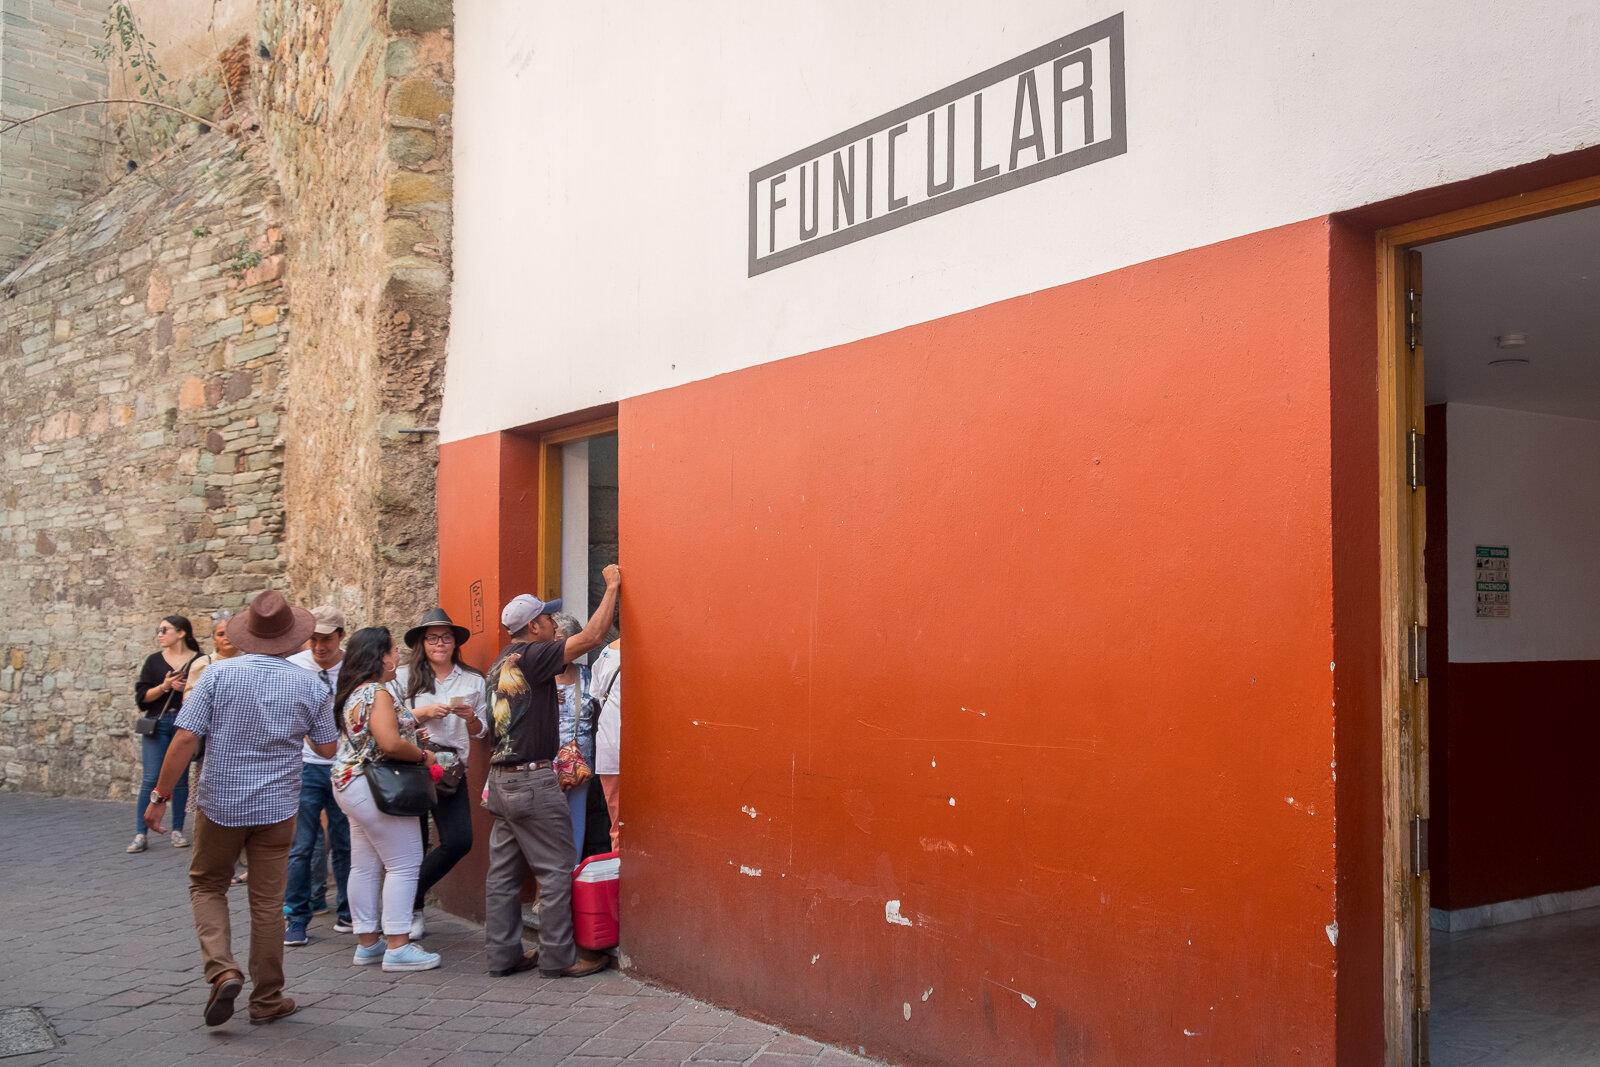 2019.10.8_Mexico_Guanajuato11_Britt first year.jpg